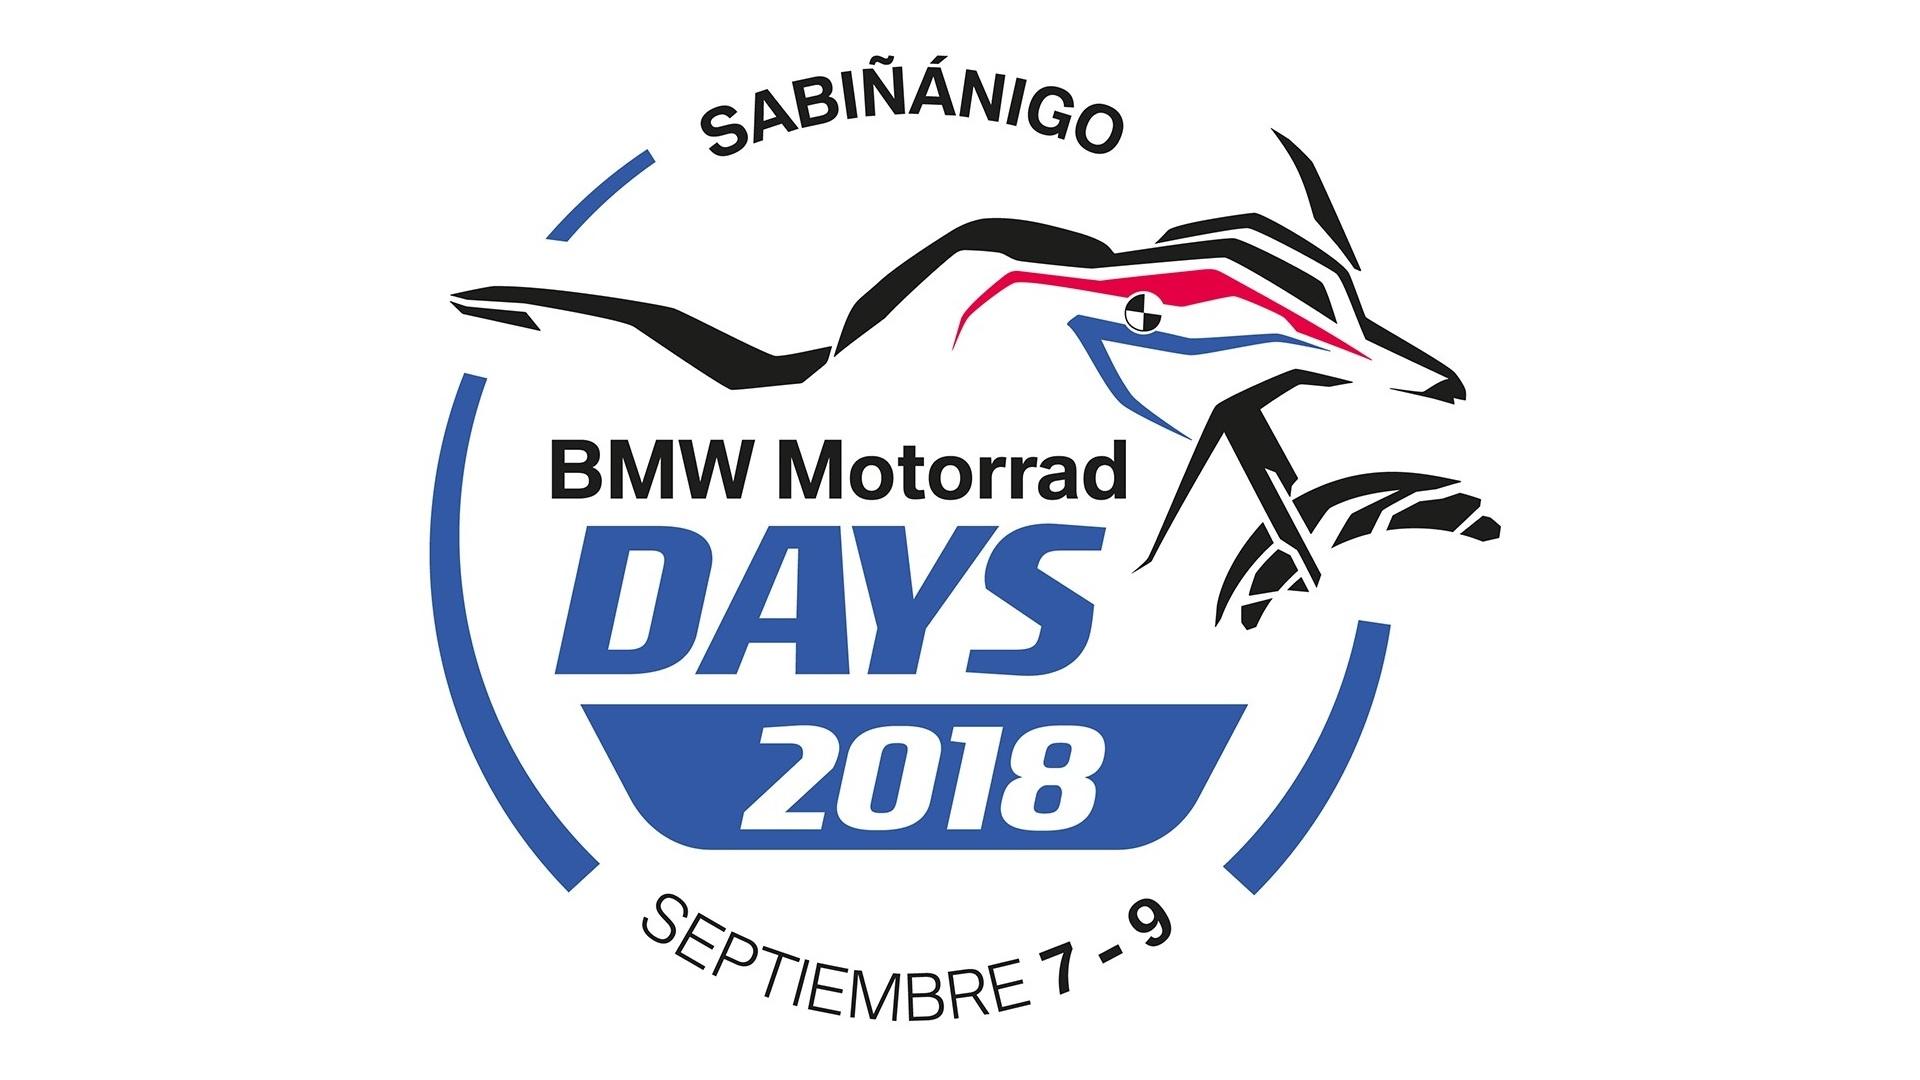 Llegan los BMW Motorrad Days 2018